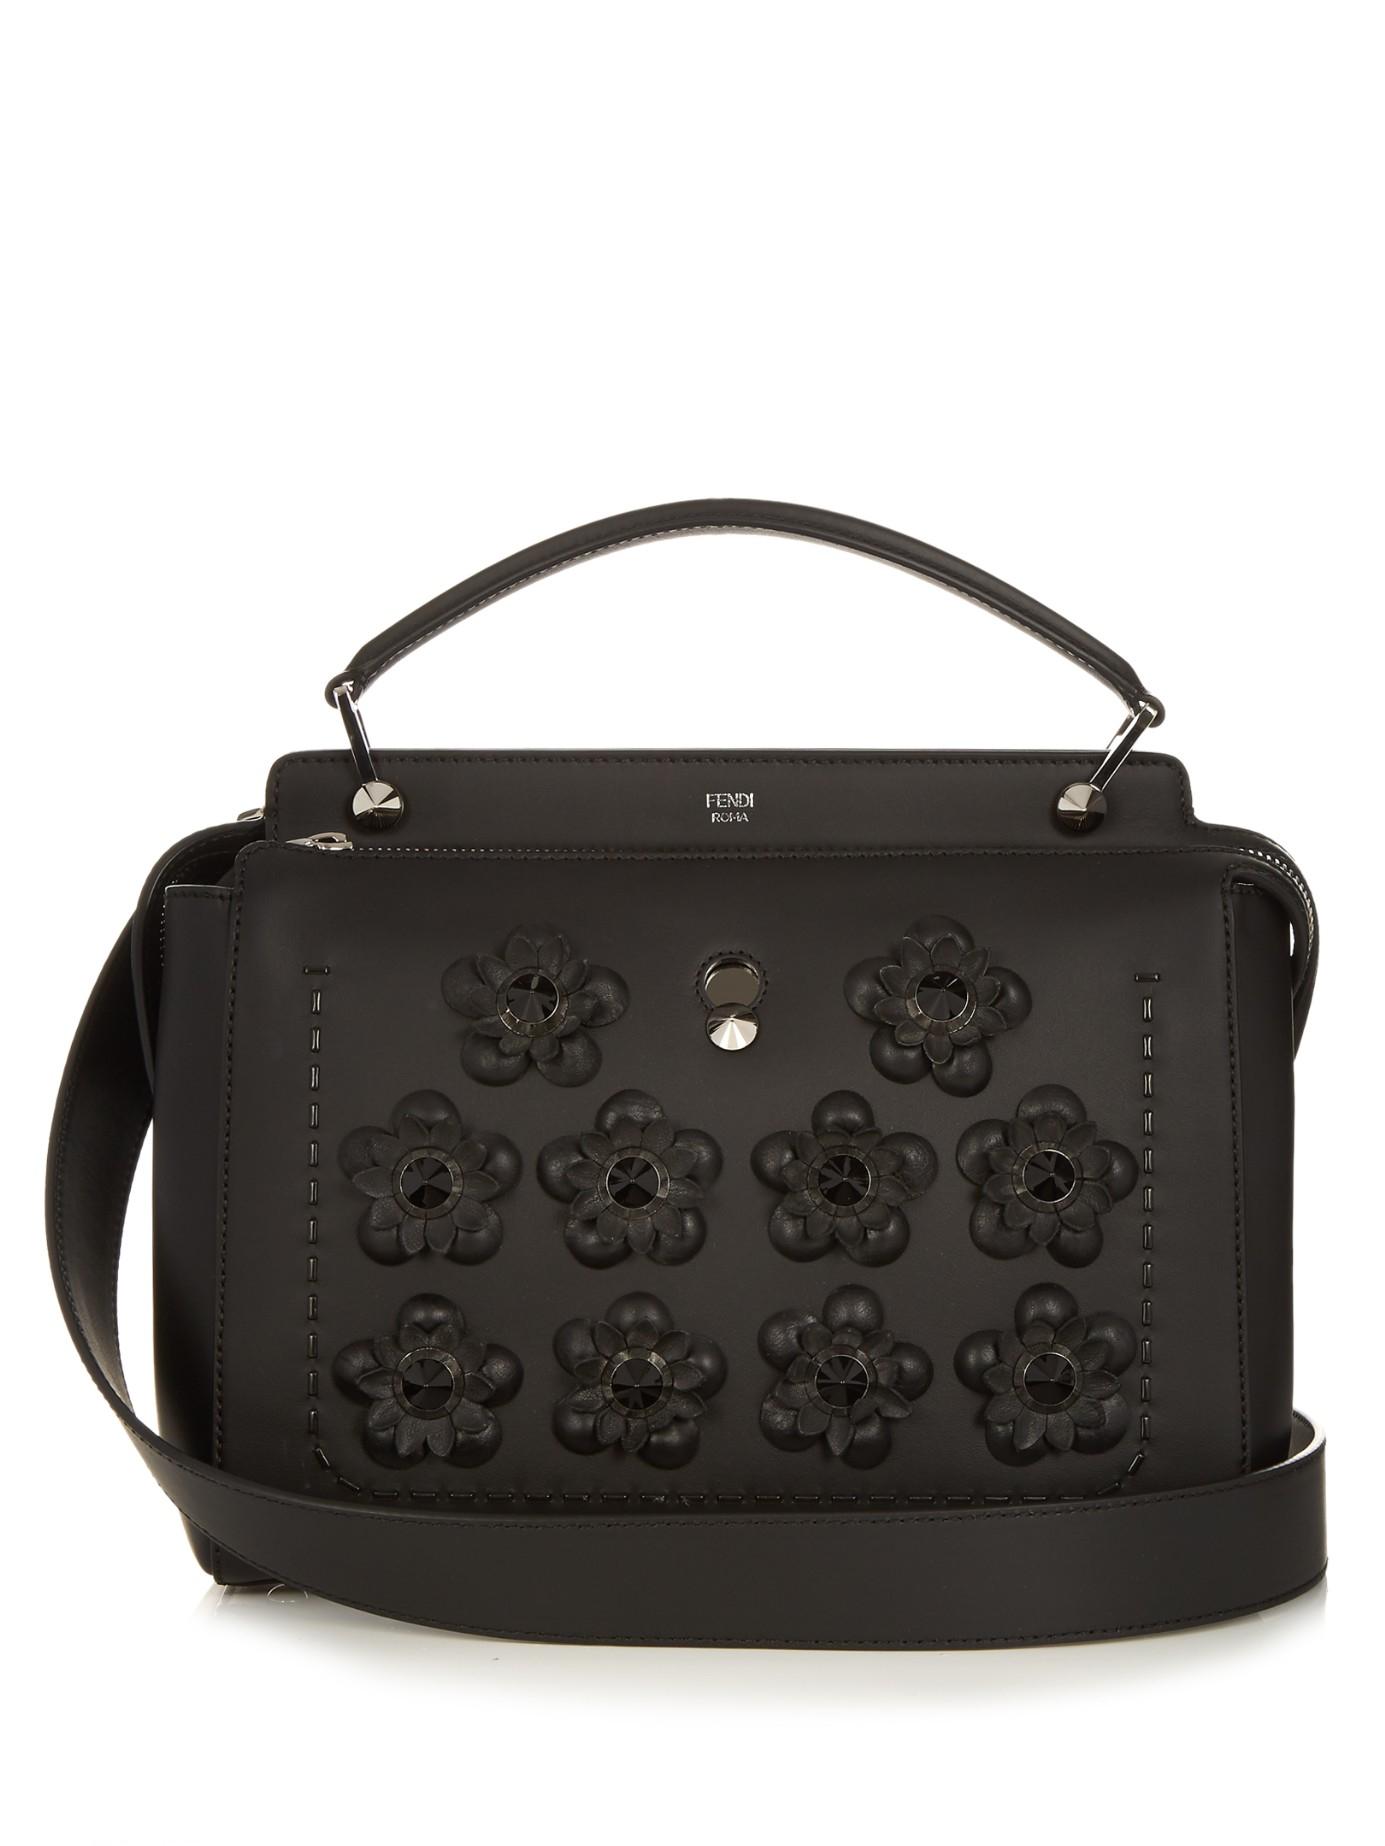 Lyst - Fendi Dotcom Flowerland-embellished Leather Bag in Black 228e96418a